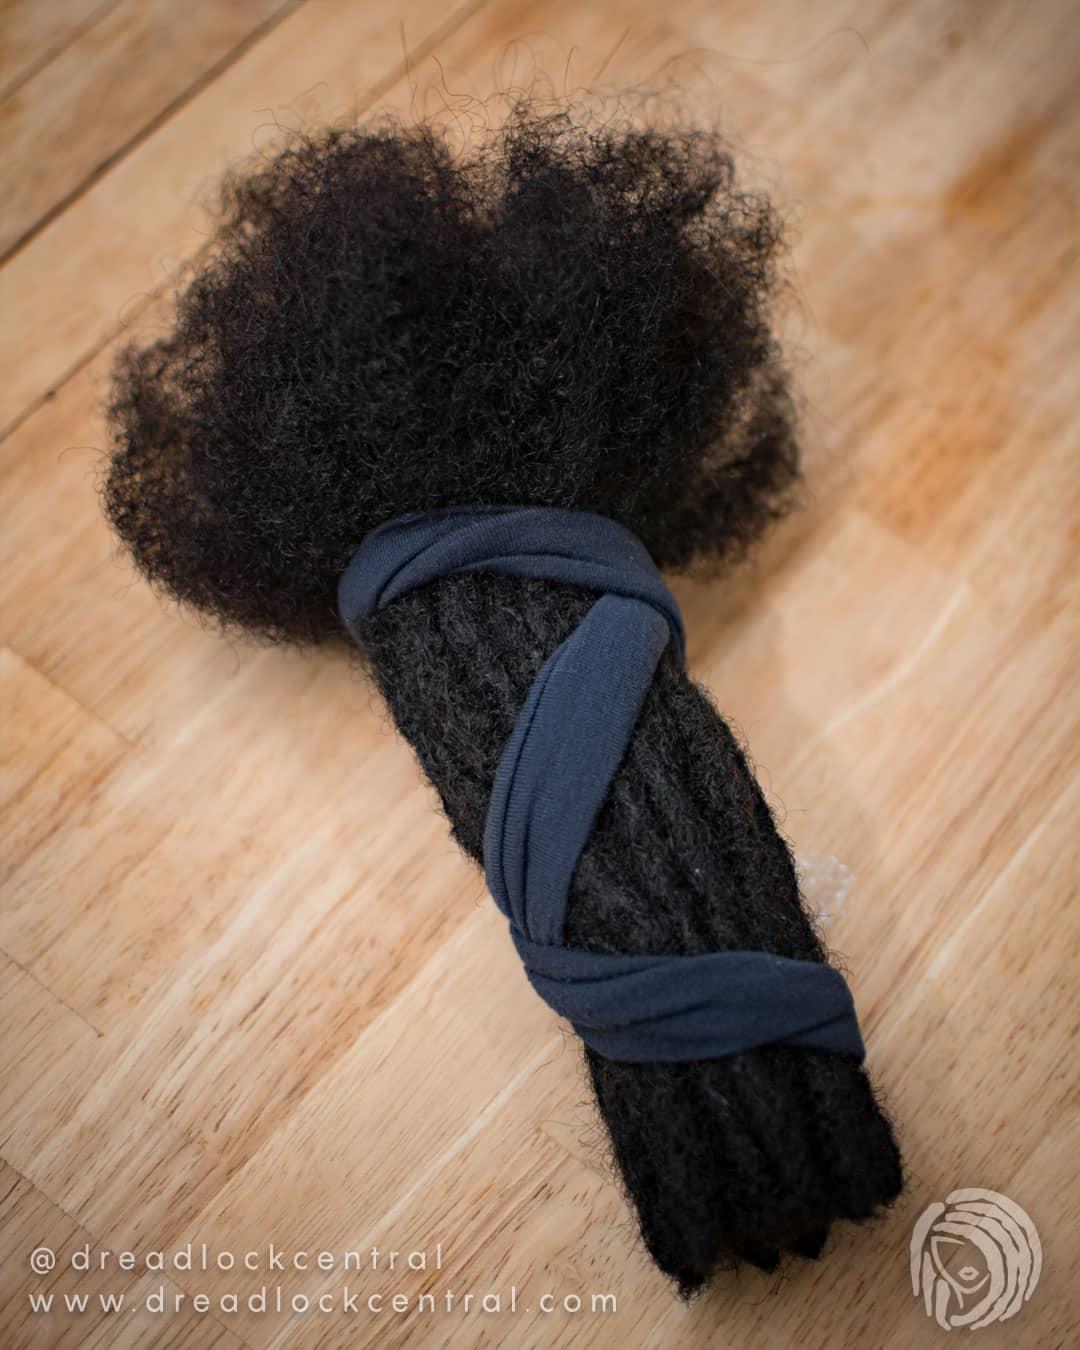 Human Hair Loc Extensions All Custom Orders Any Length